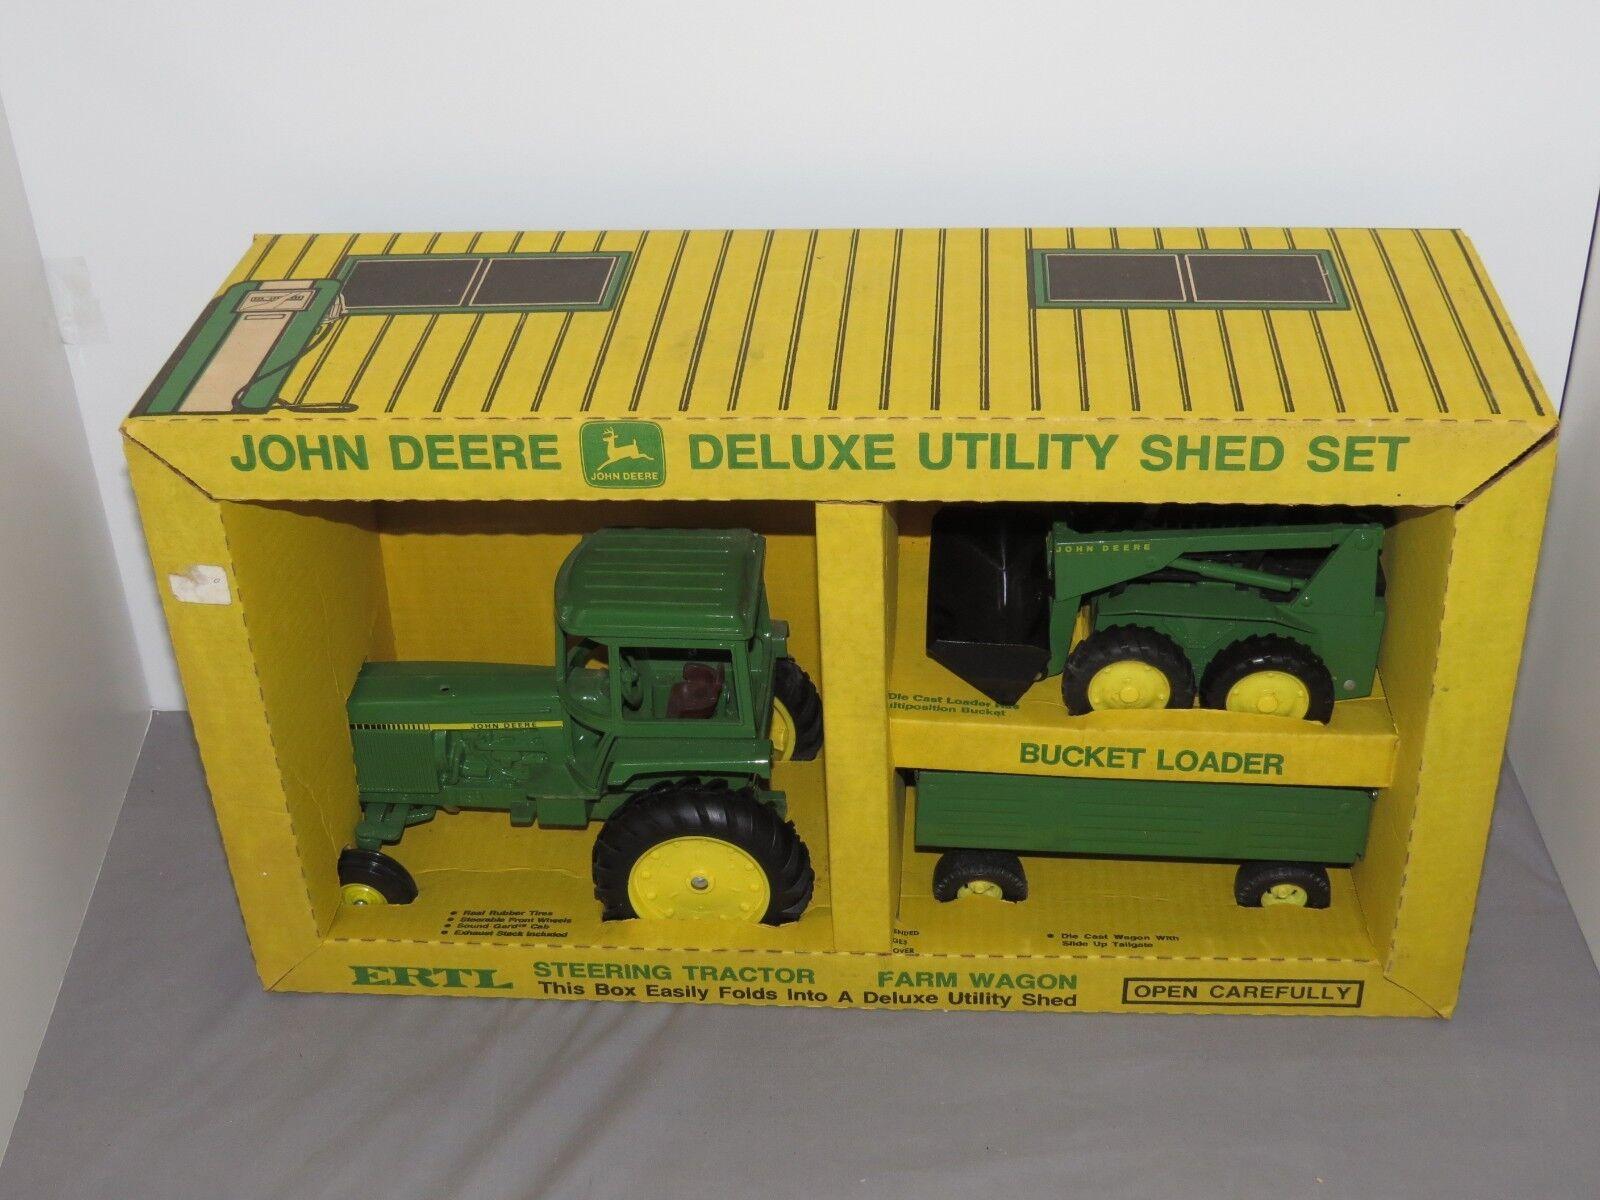 Vintage John Deere Deluxe Farm Shed Set 4450 Tractor Skid Steer Wagon Ertl 1 16